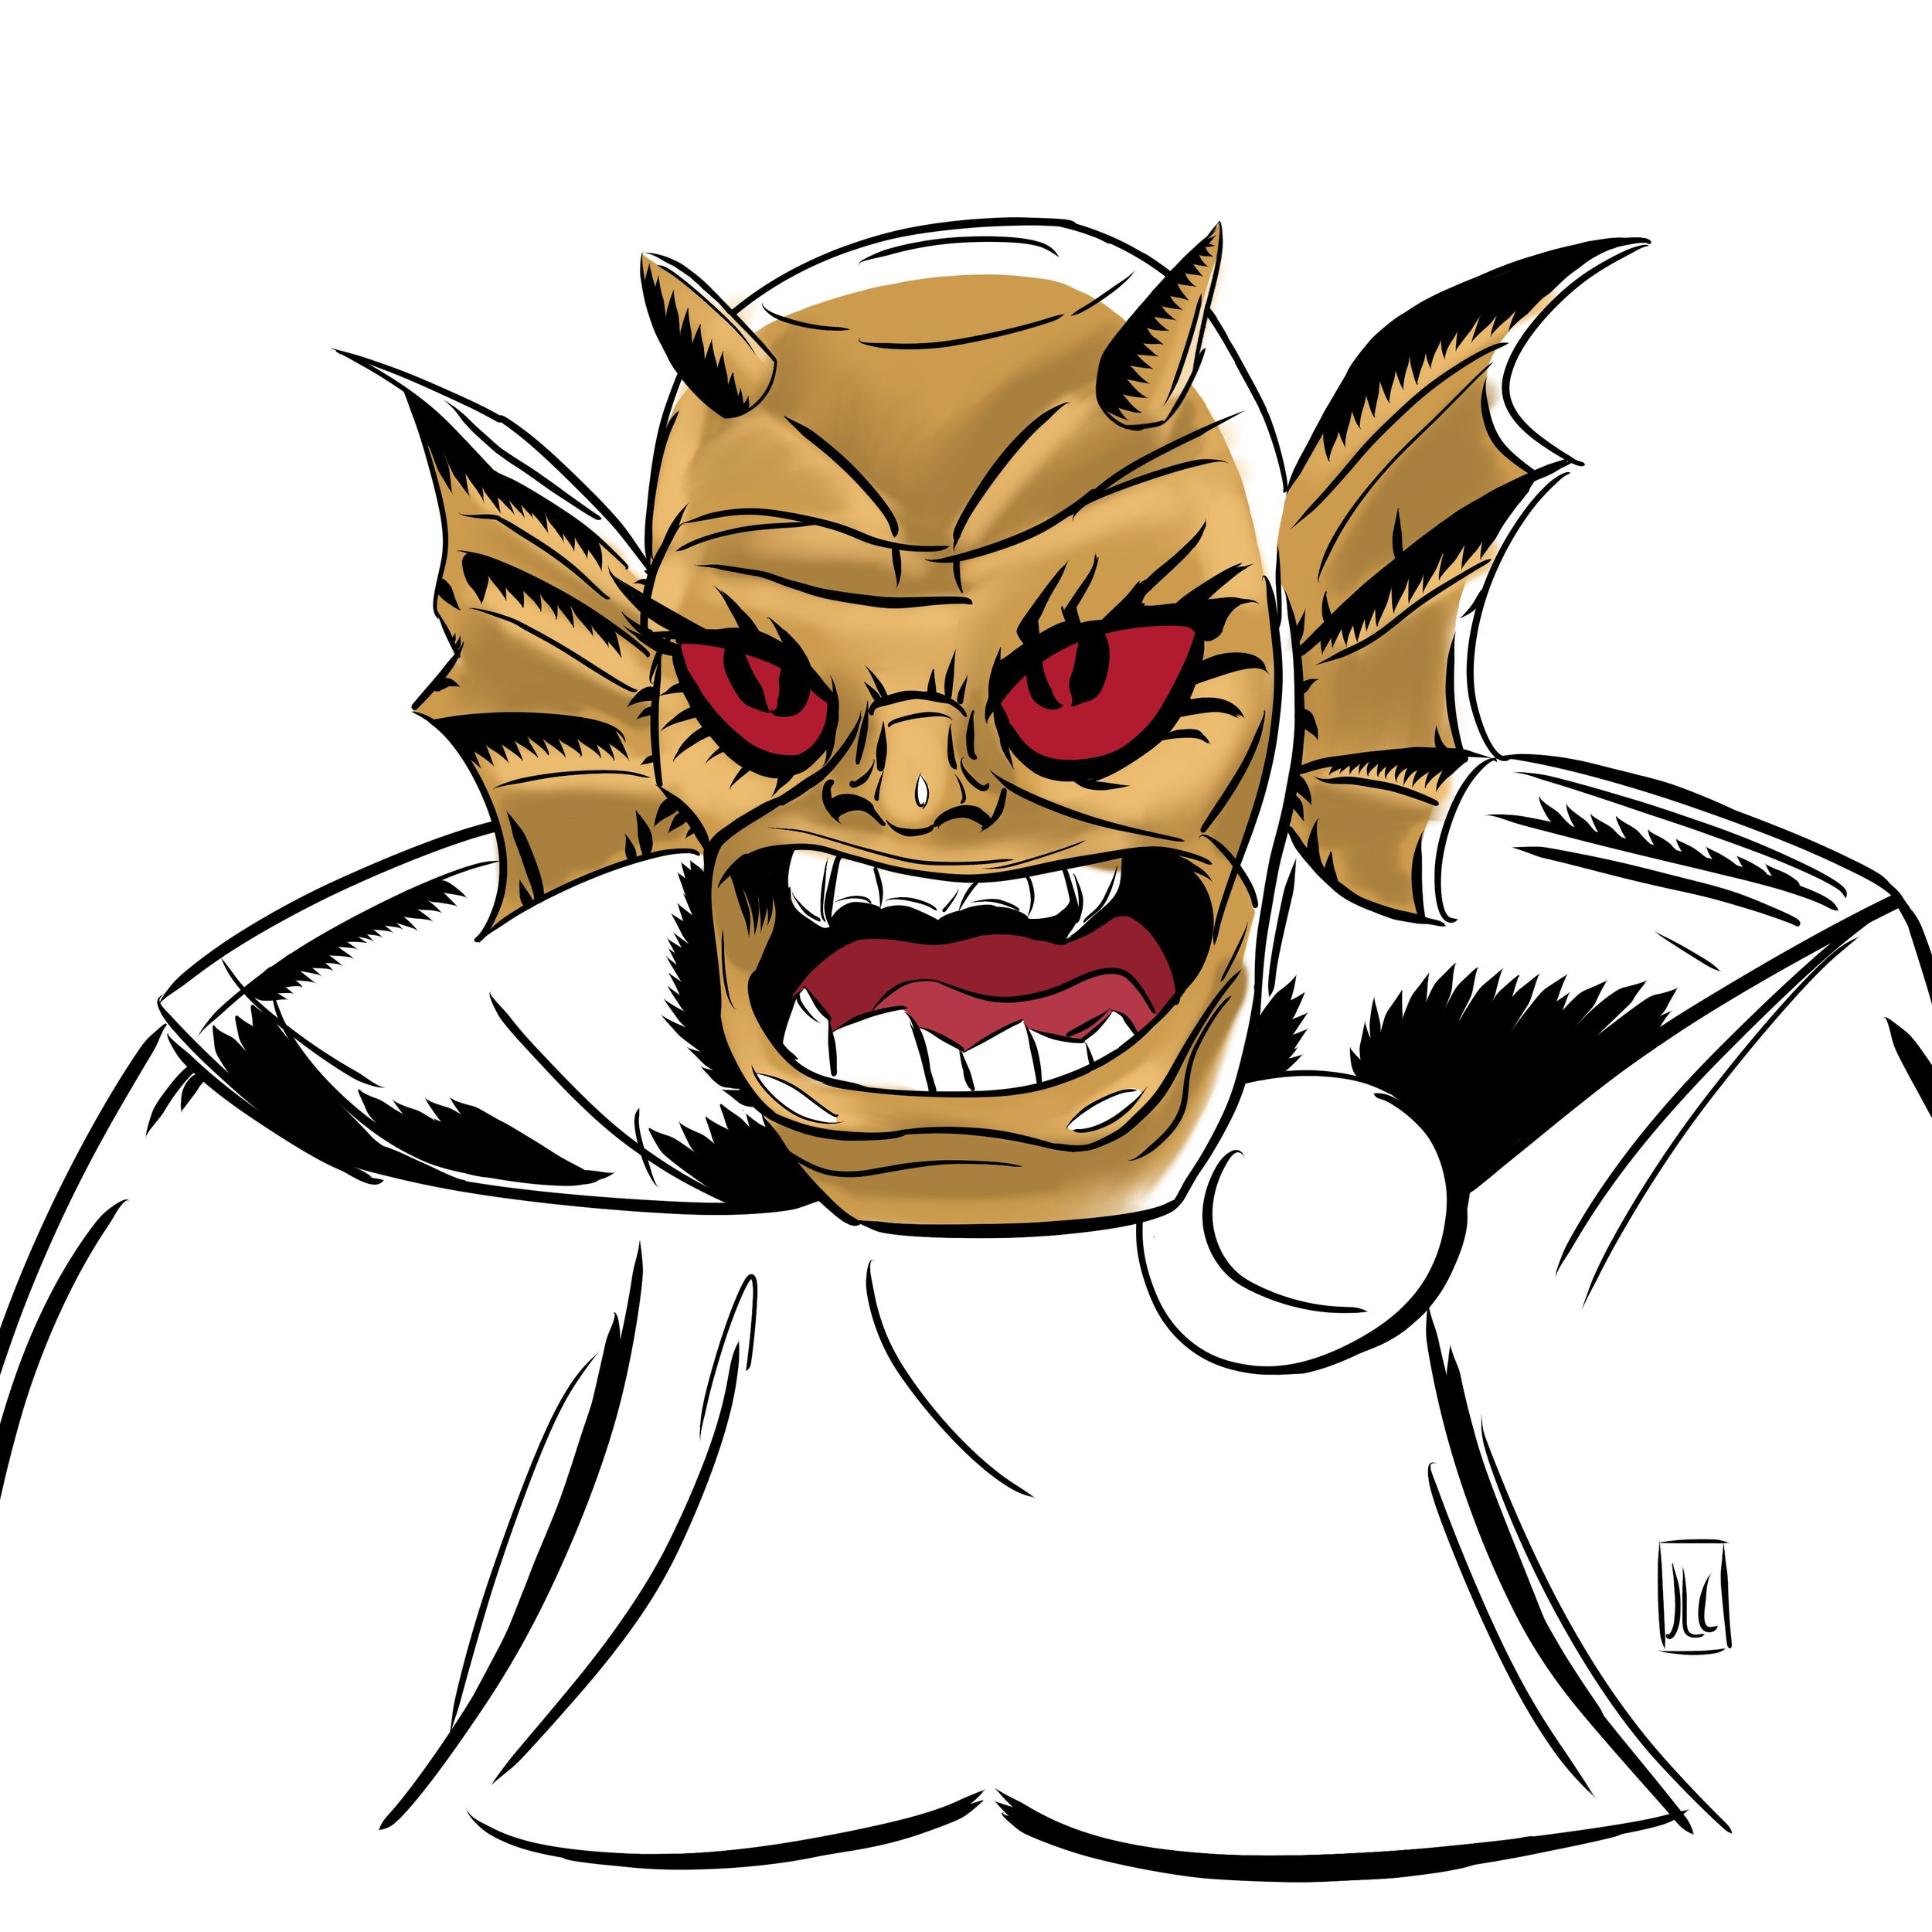 Etrigan / The Demon